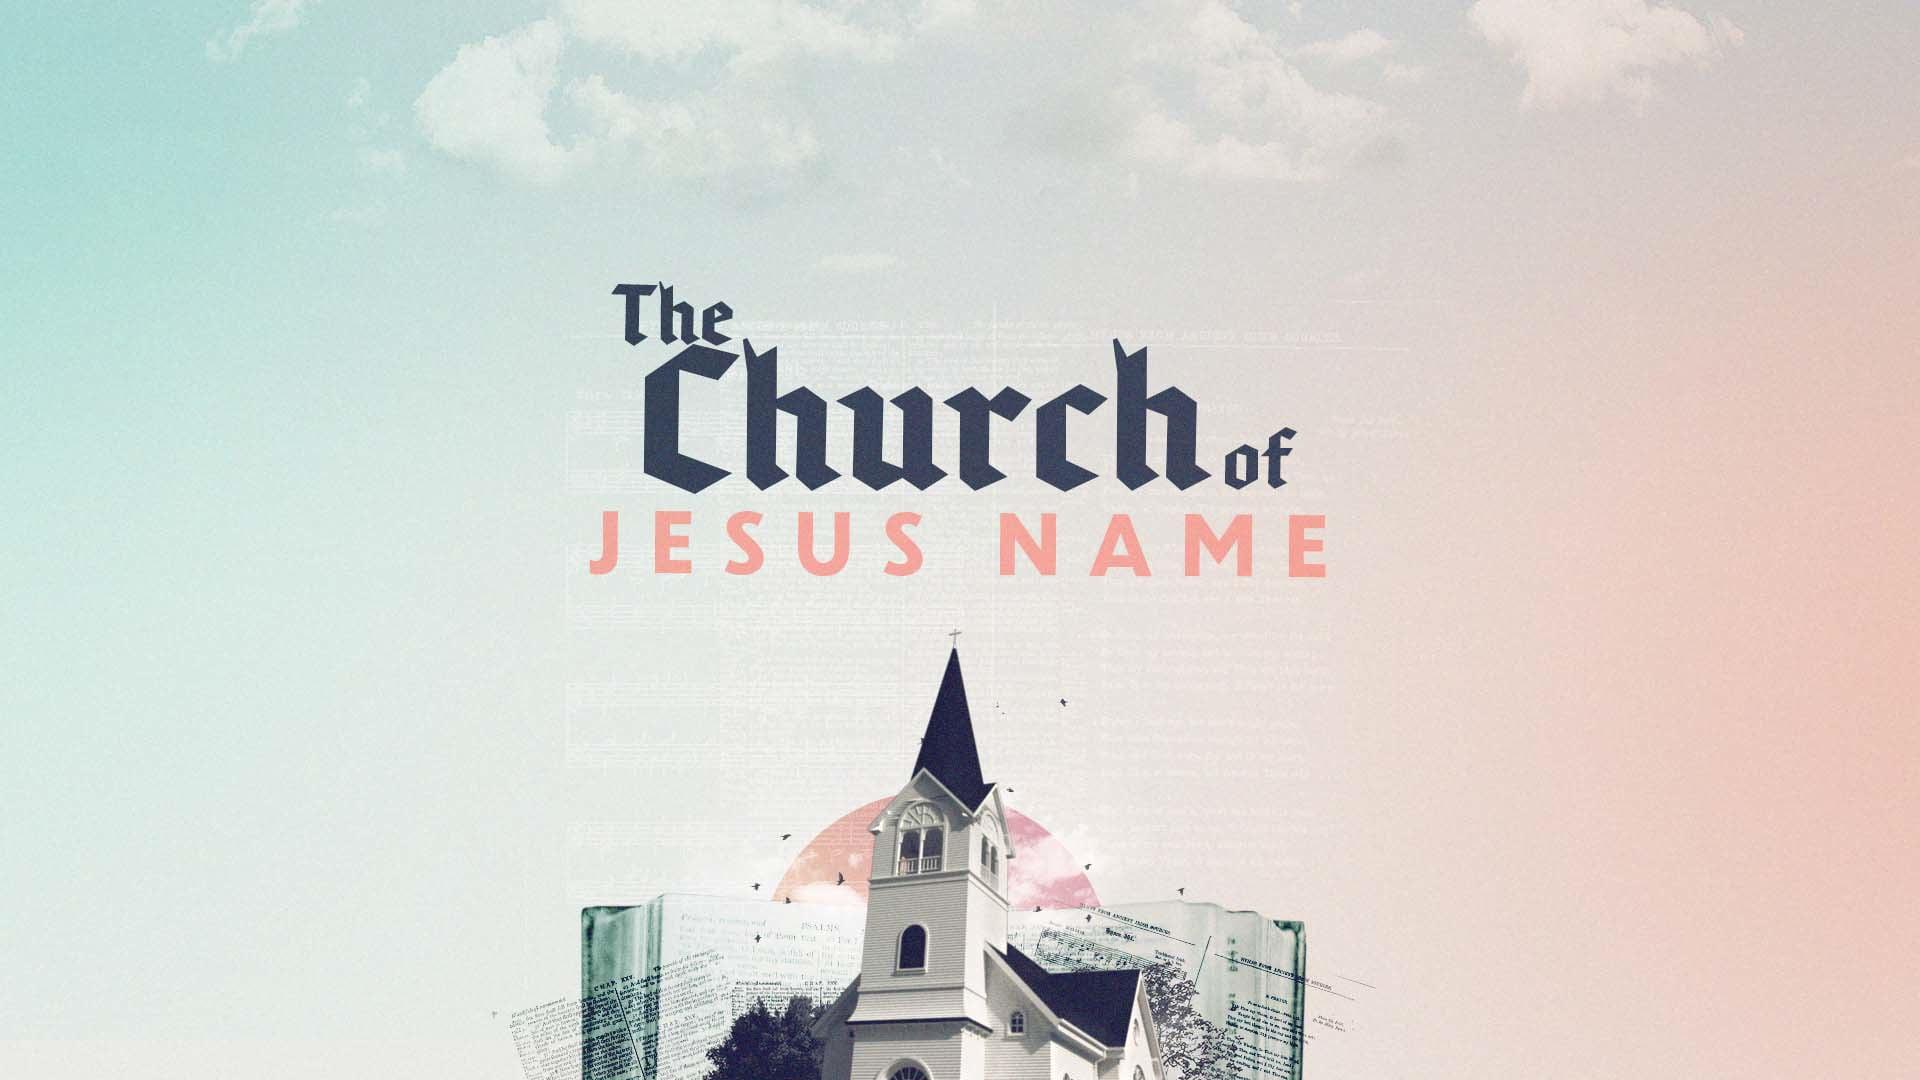 The Church of Jesus Name